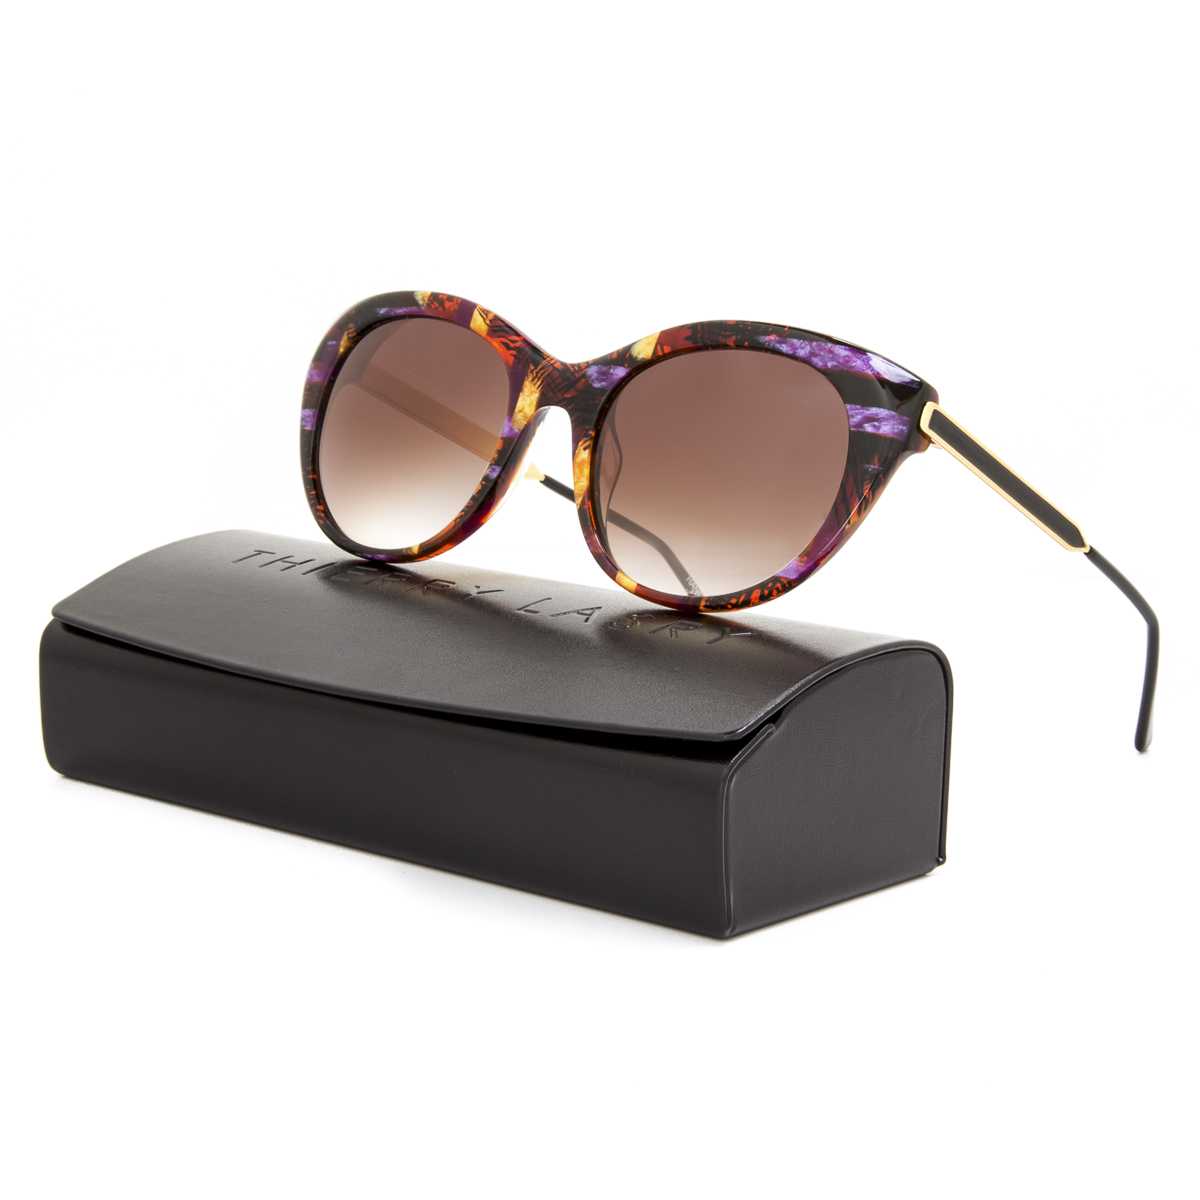 Thierry Lasry Fingery Sunglasses E91 Vintage Purple & Gold ...